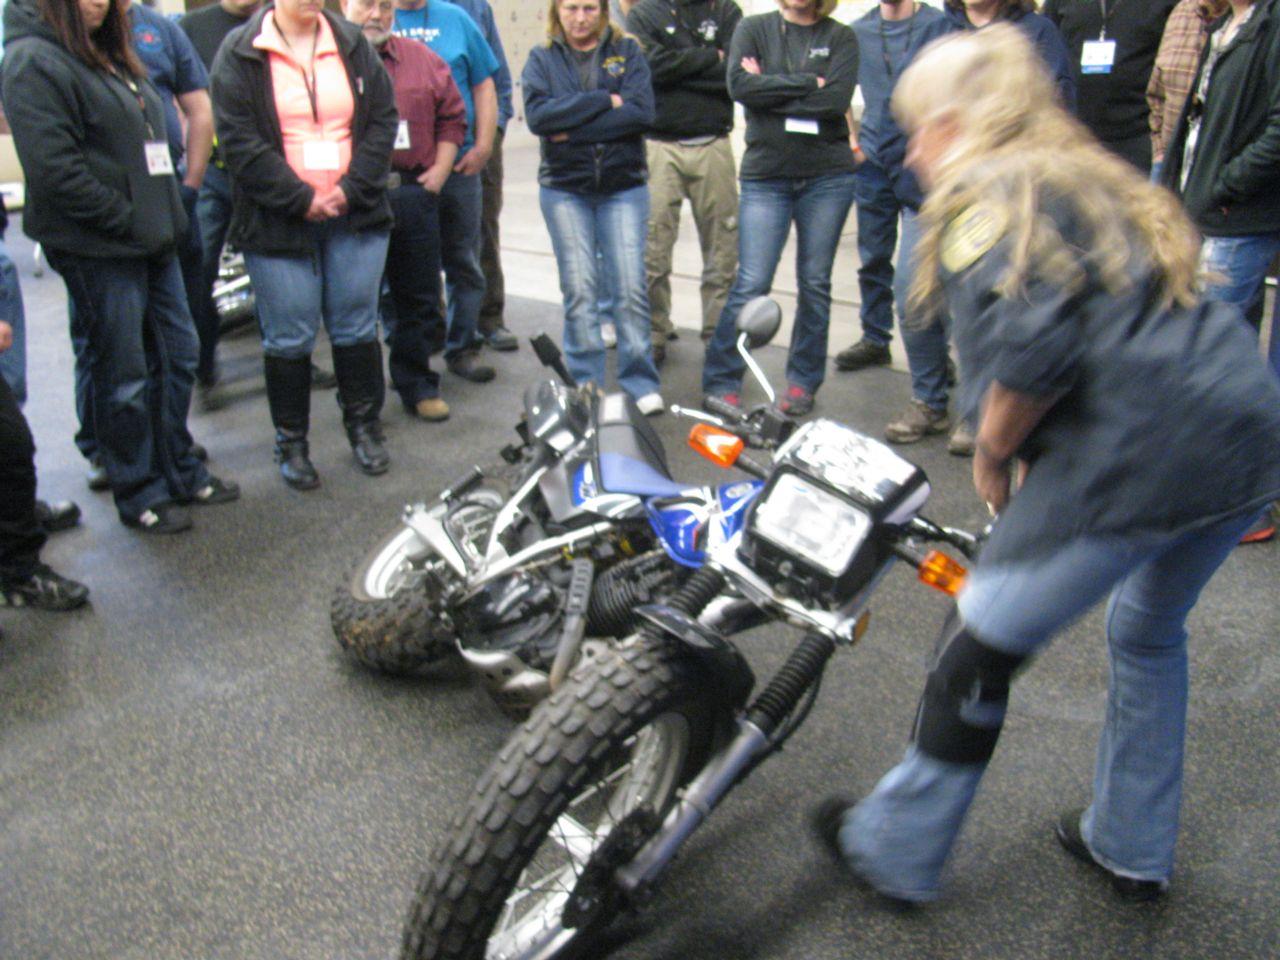 Accident Scene Management huddled around bike